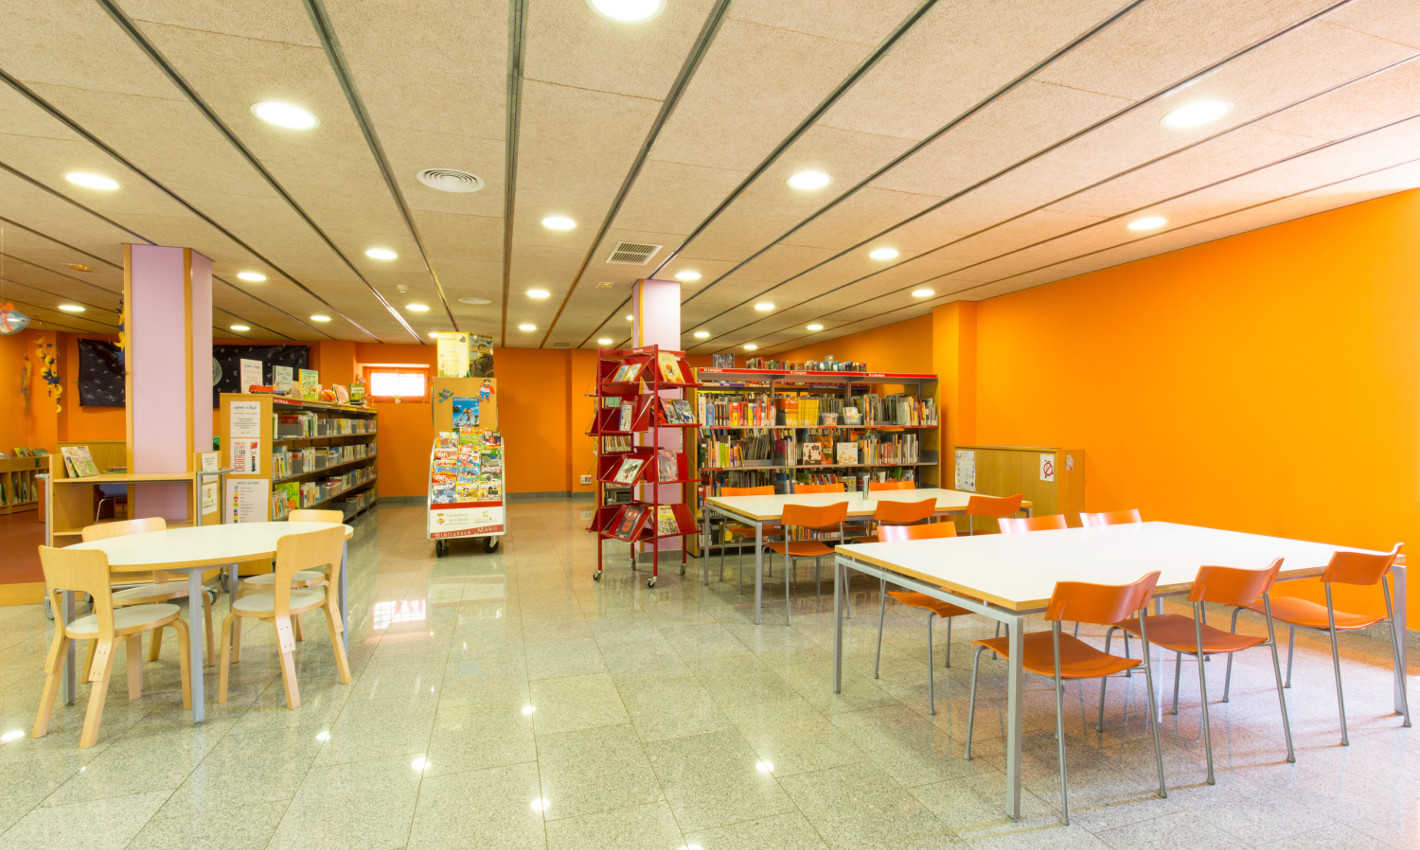 Planta baixa Biblioteca Can Salvador de la Plaça